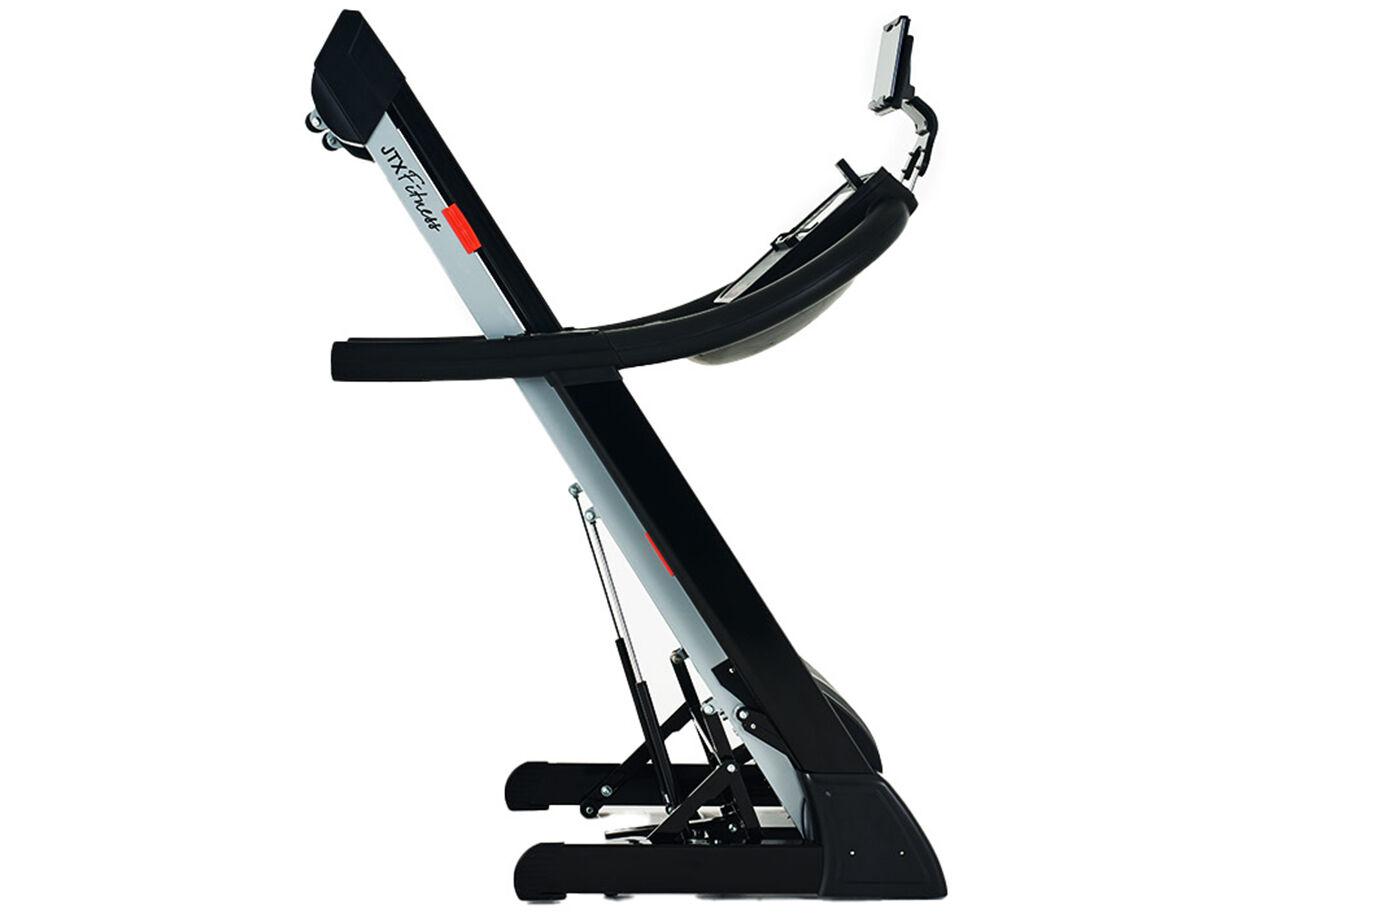 Professional Folding Treadmill by JTX Fitness